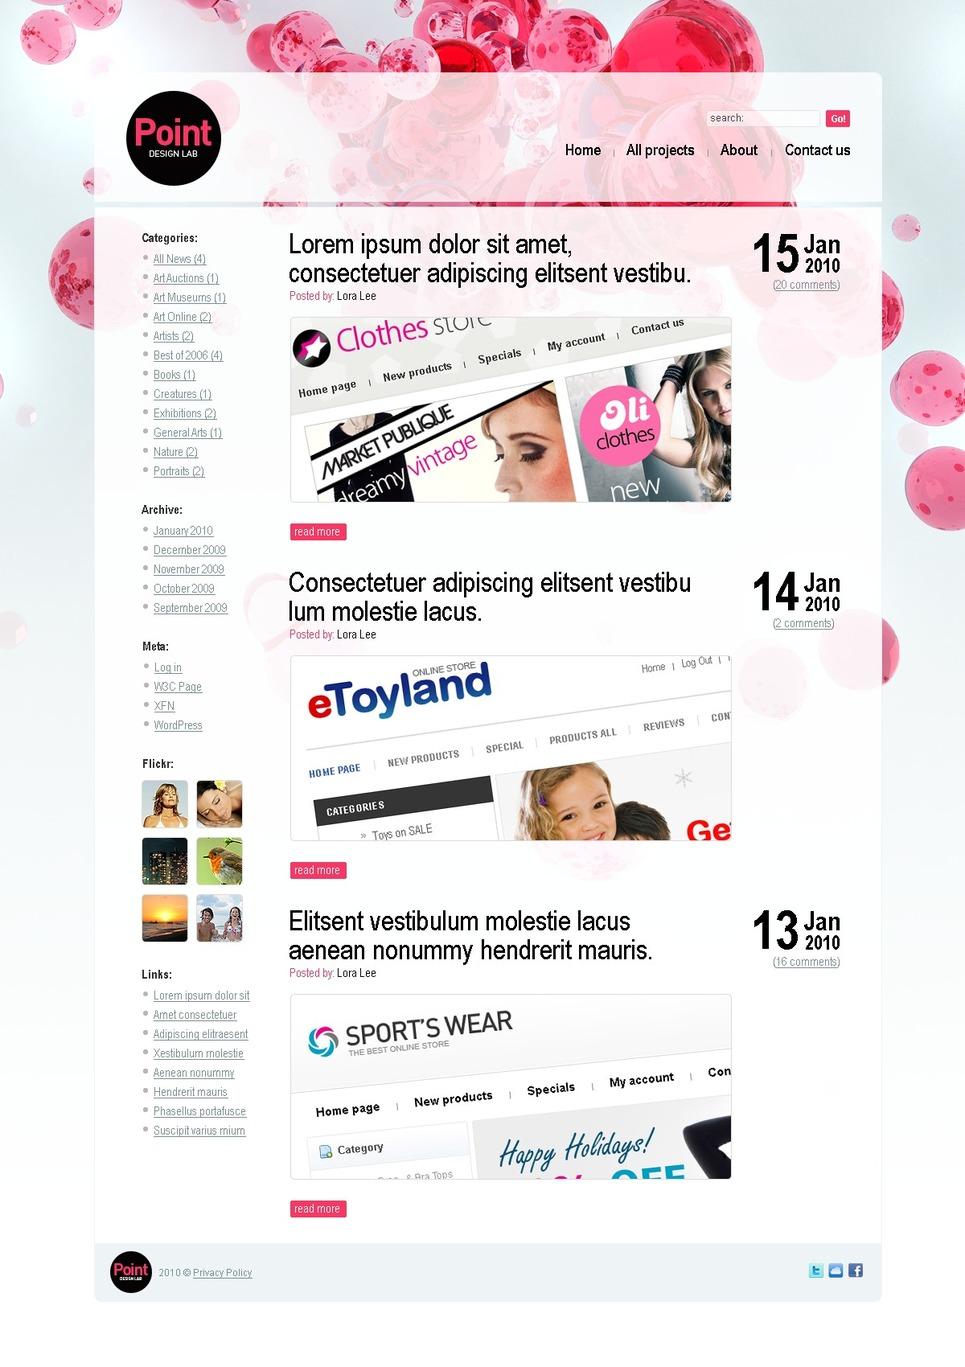 cewetare  Just another WordPresscom site